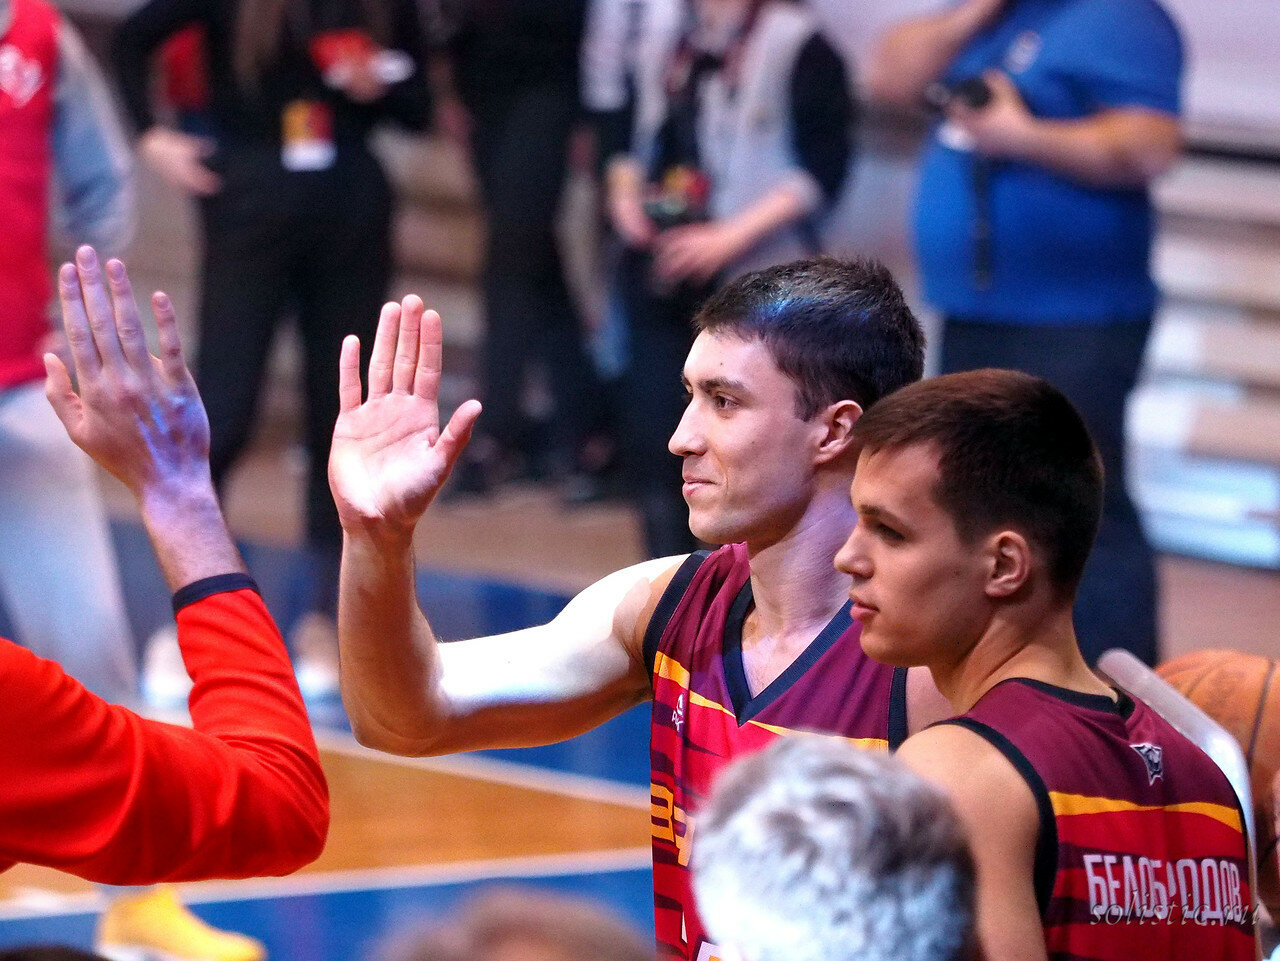 97 Матч звезд АСБ 2018 (ассоциации студенческого баскетбола)